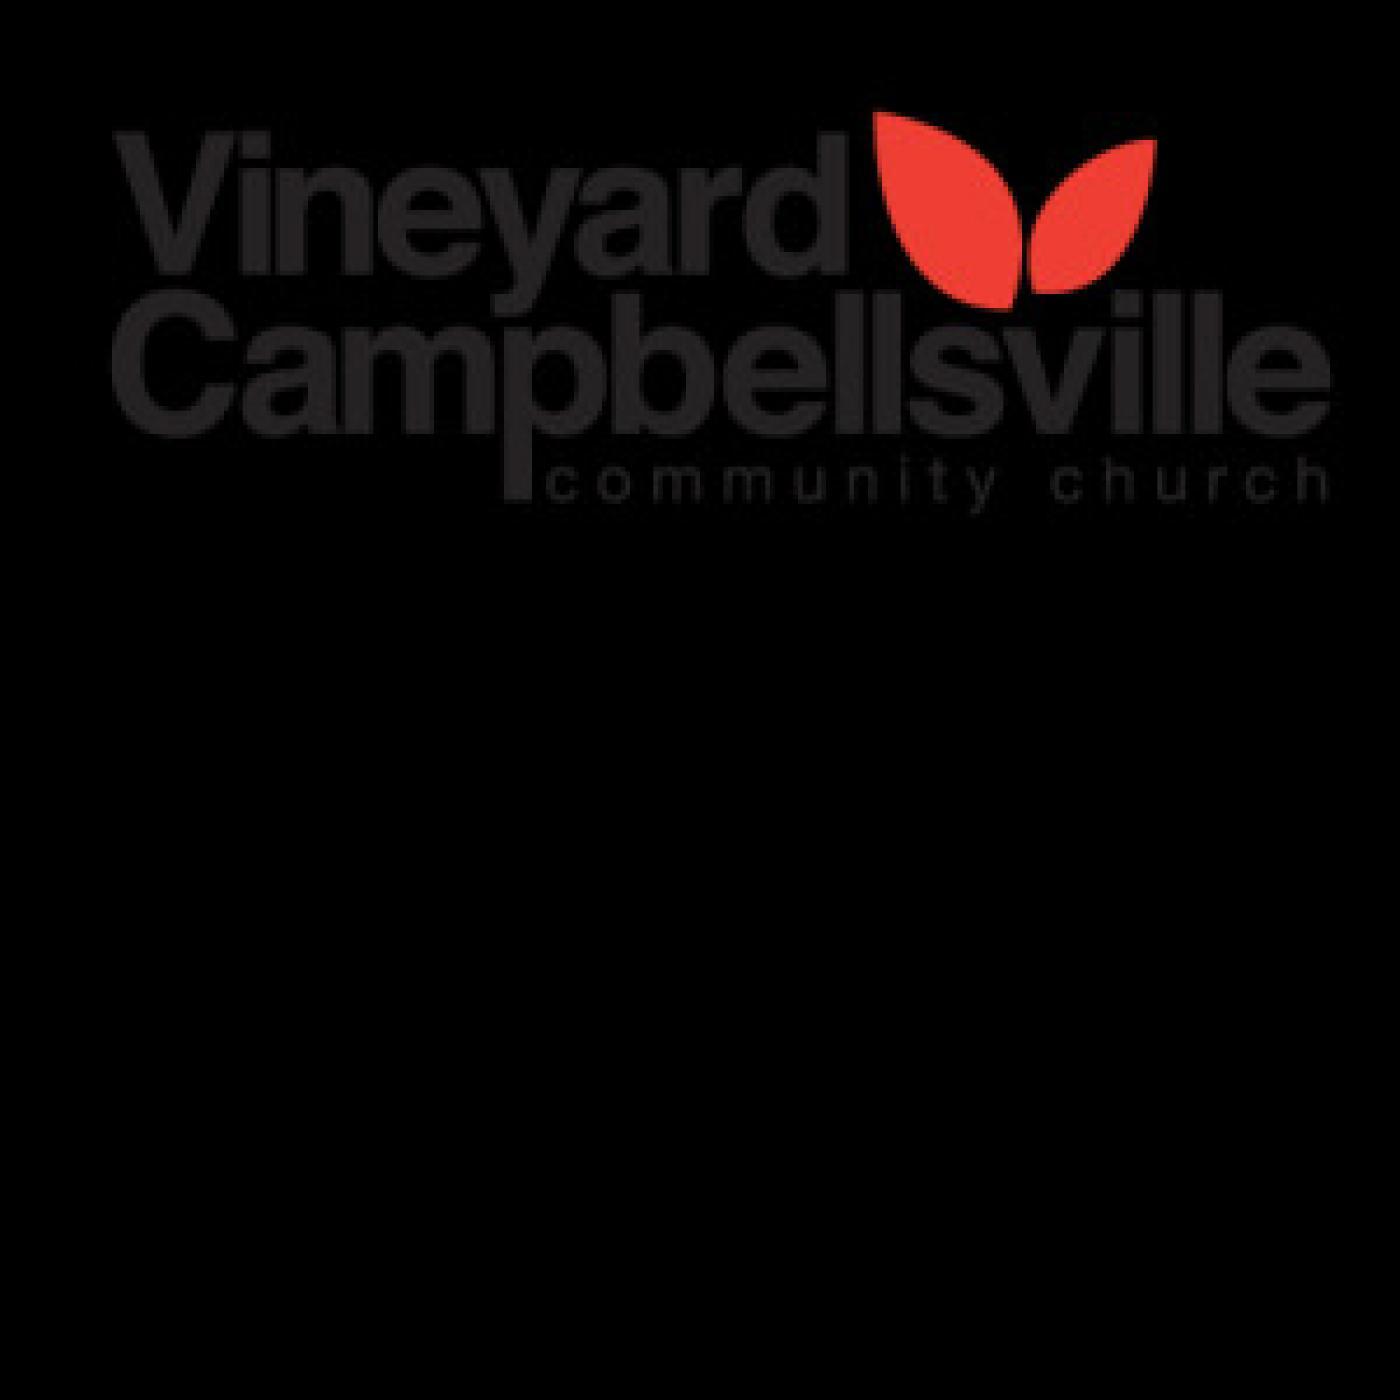 Vineyard Campbellsville Podcast